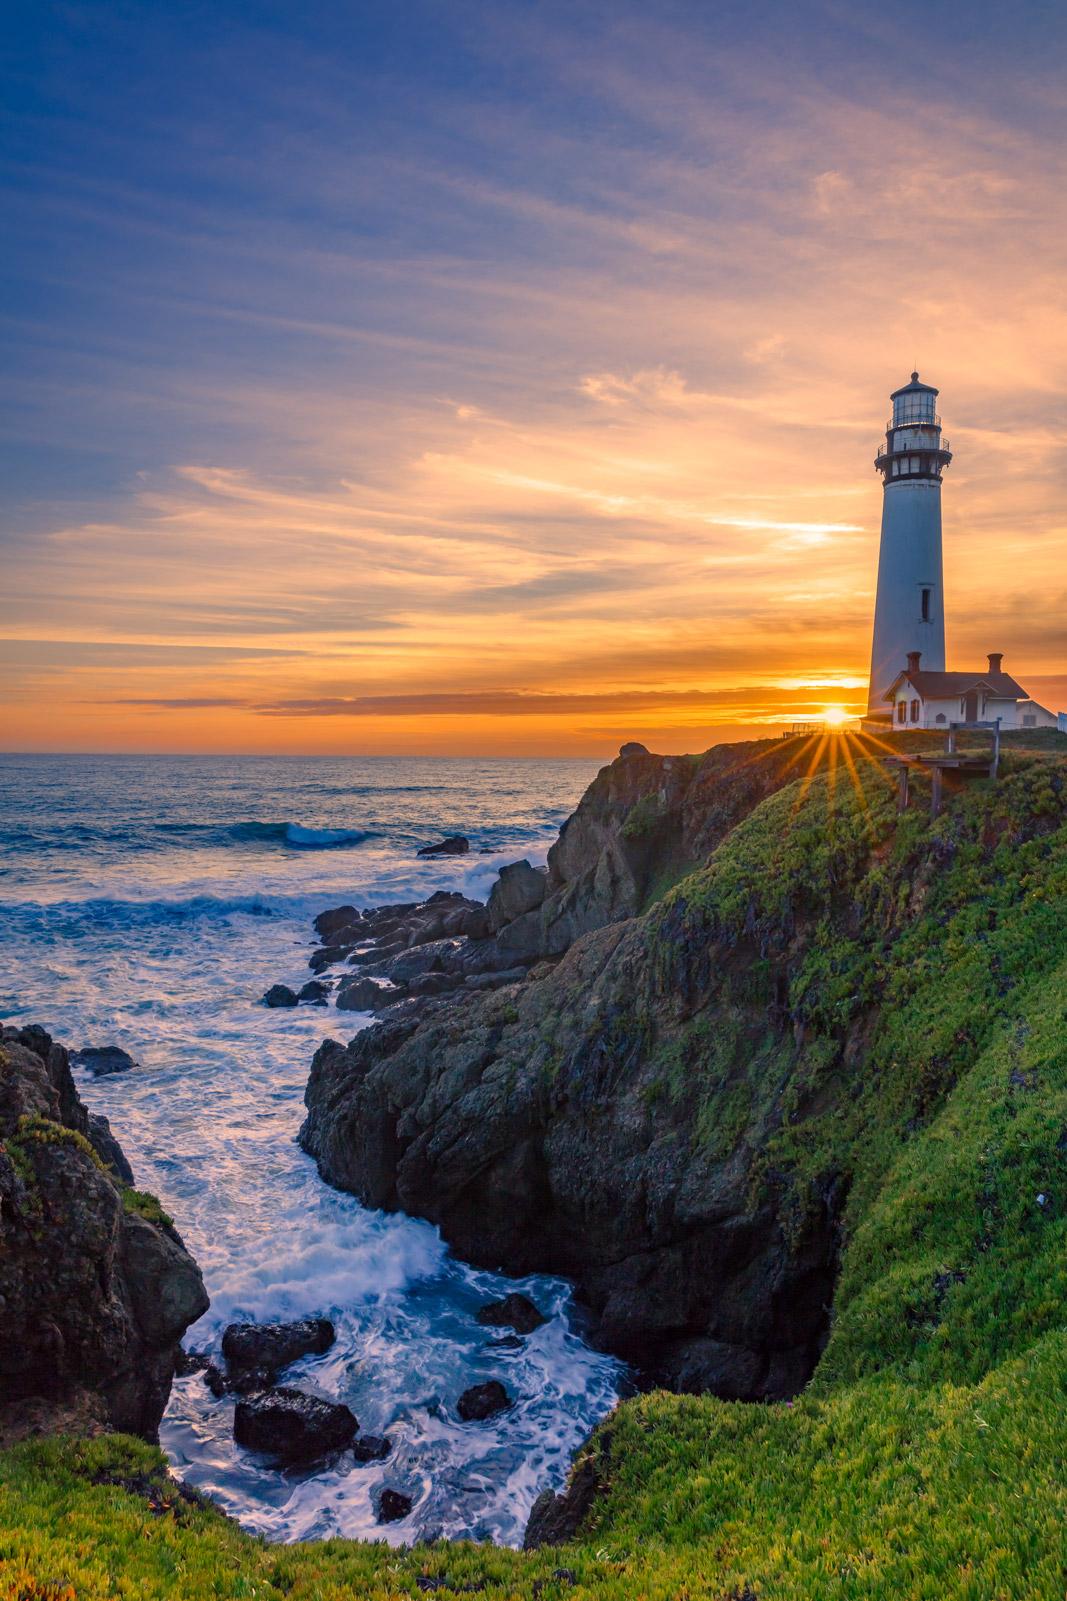 California Coast, Pigeon Point, Lighthouse, Sunset, coast, Pacific Coast, photo